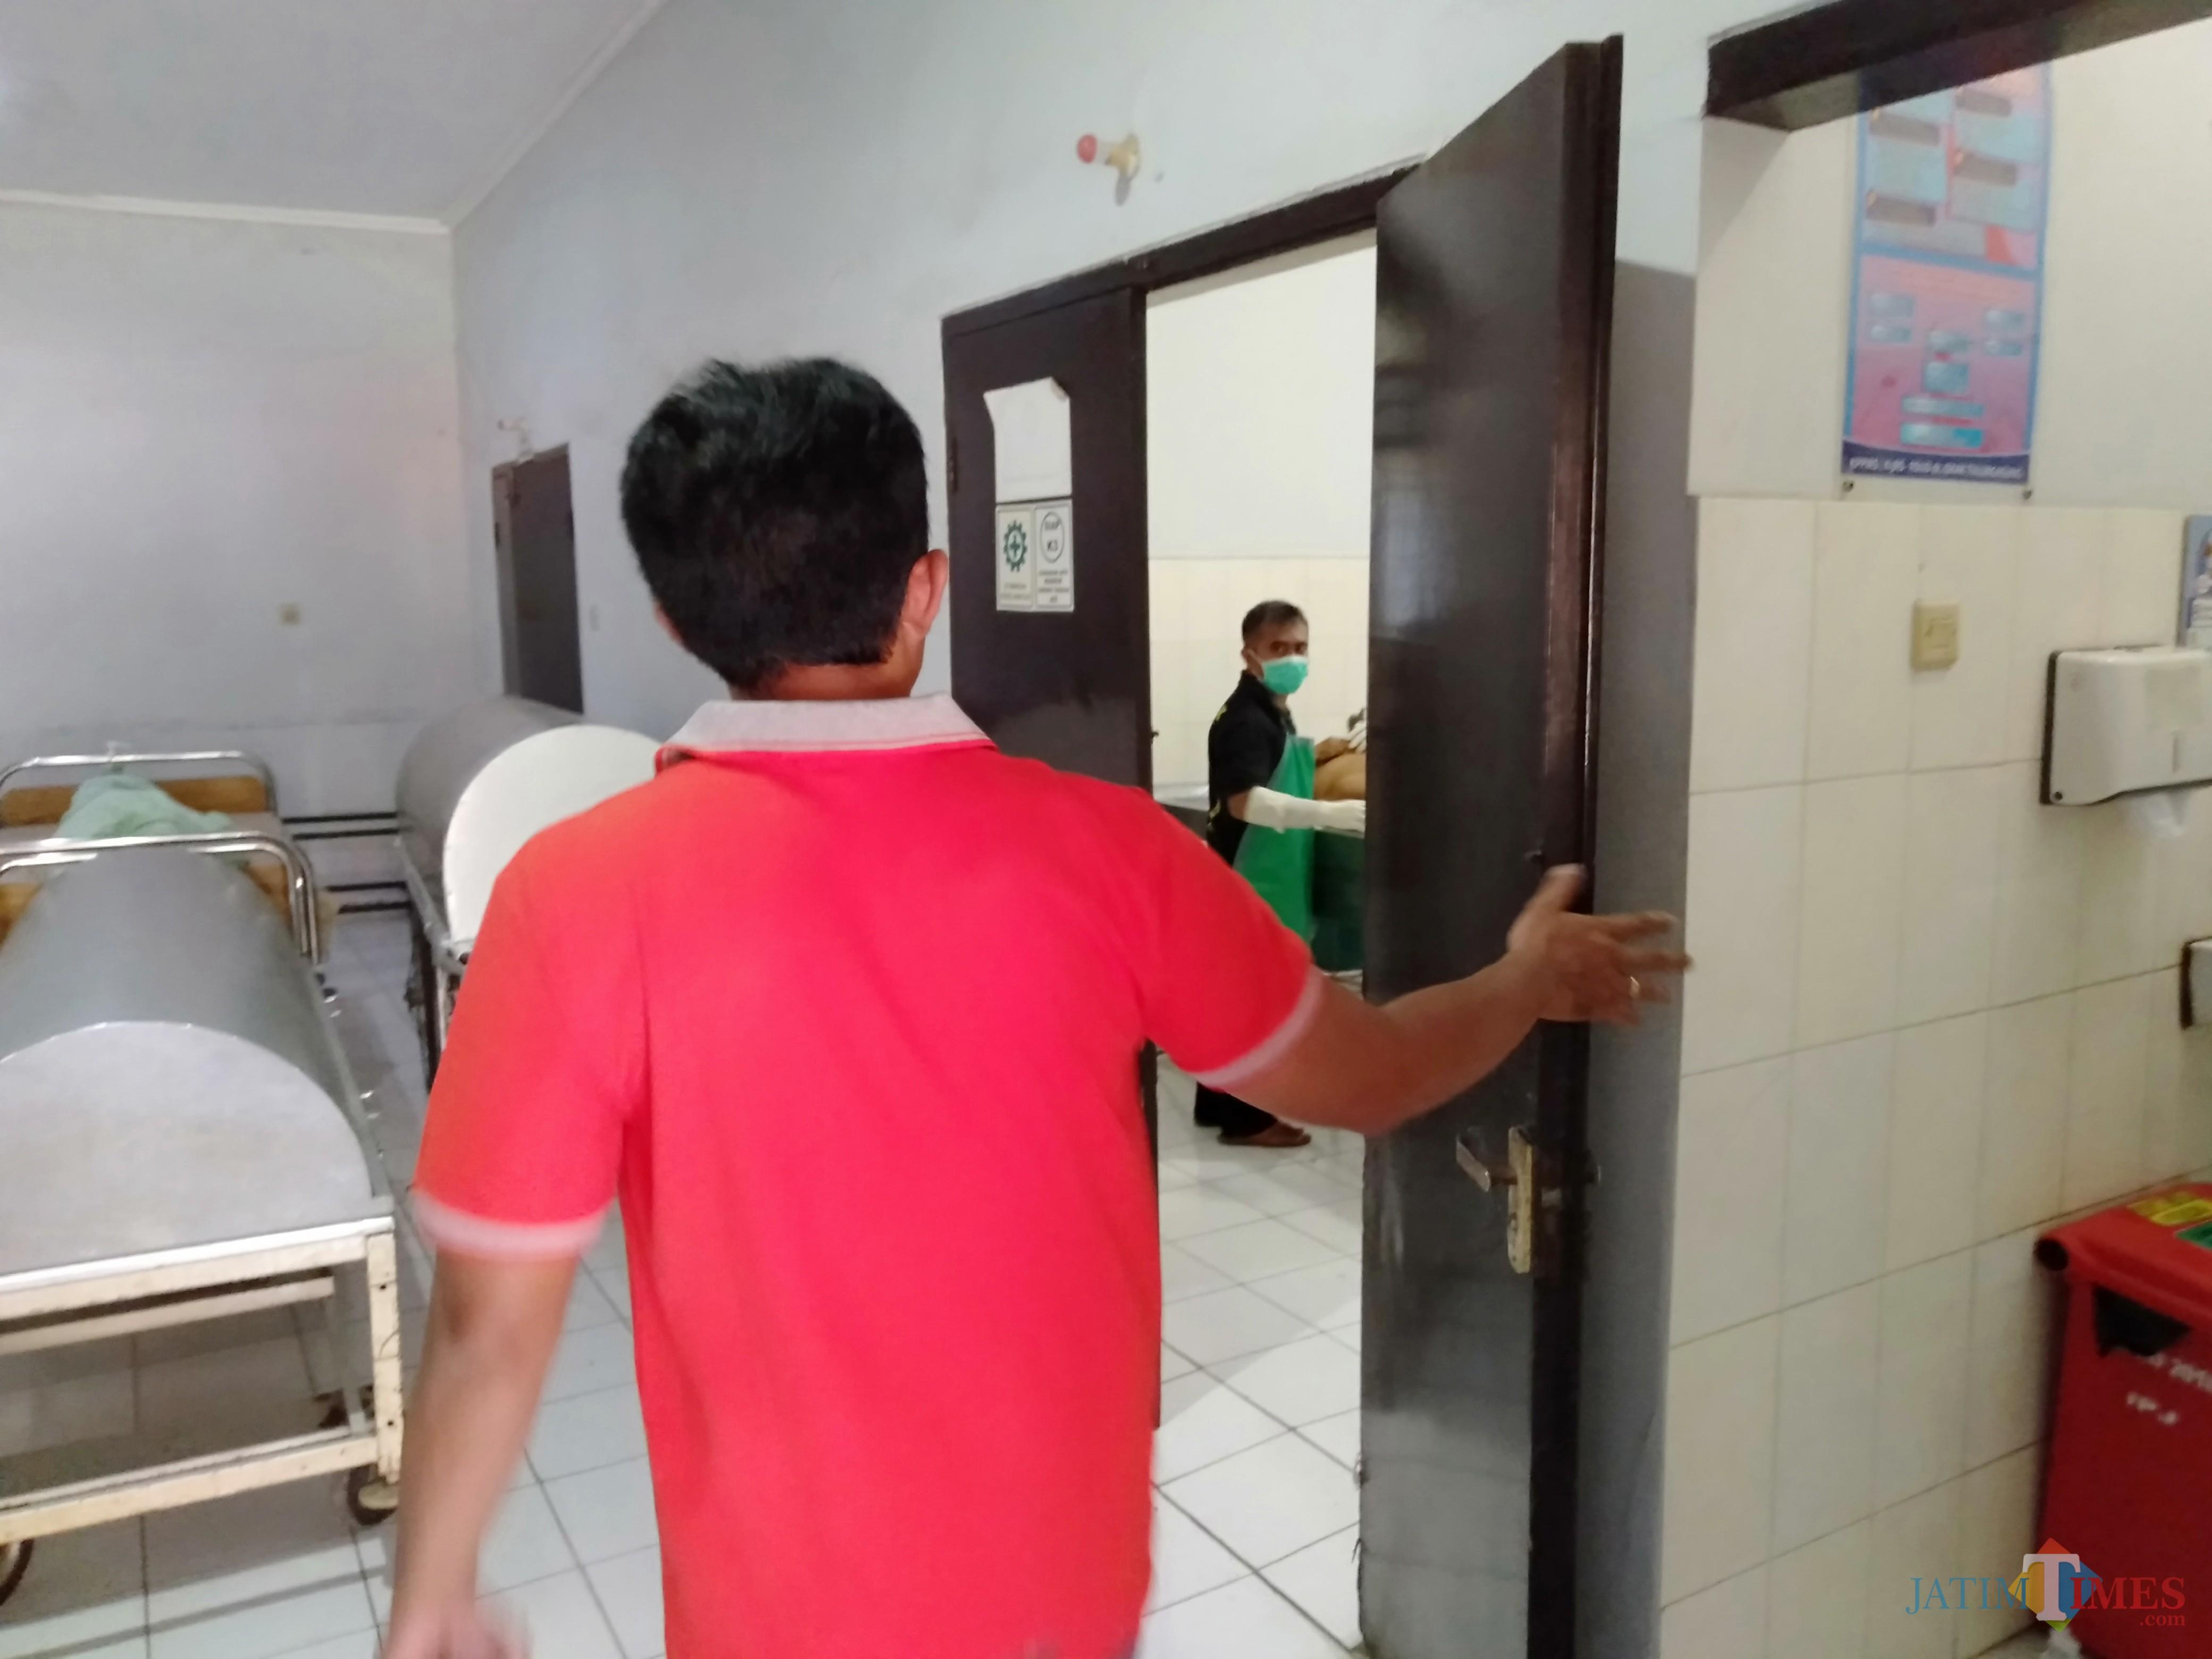 Petugas saat lakukan autopsi pada kedua jasad korban tragedi Bangoan (foto : Joko Pramono/Jatimtimes)